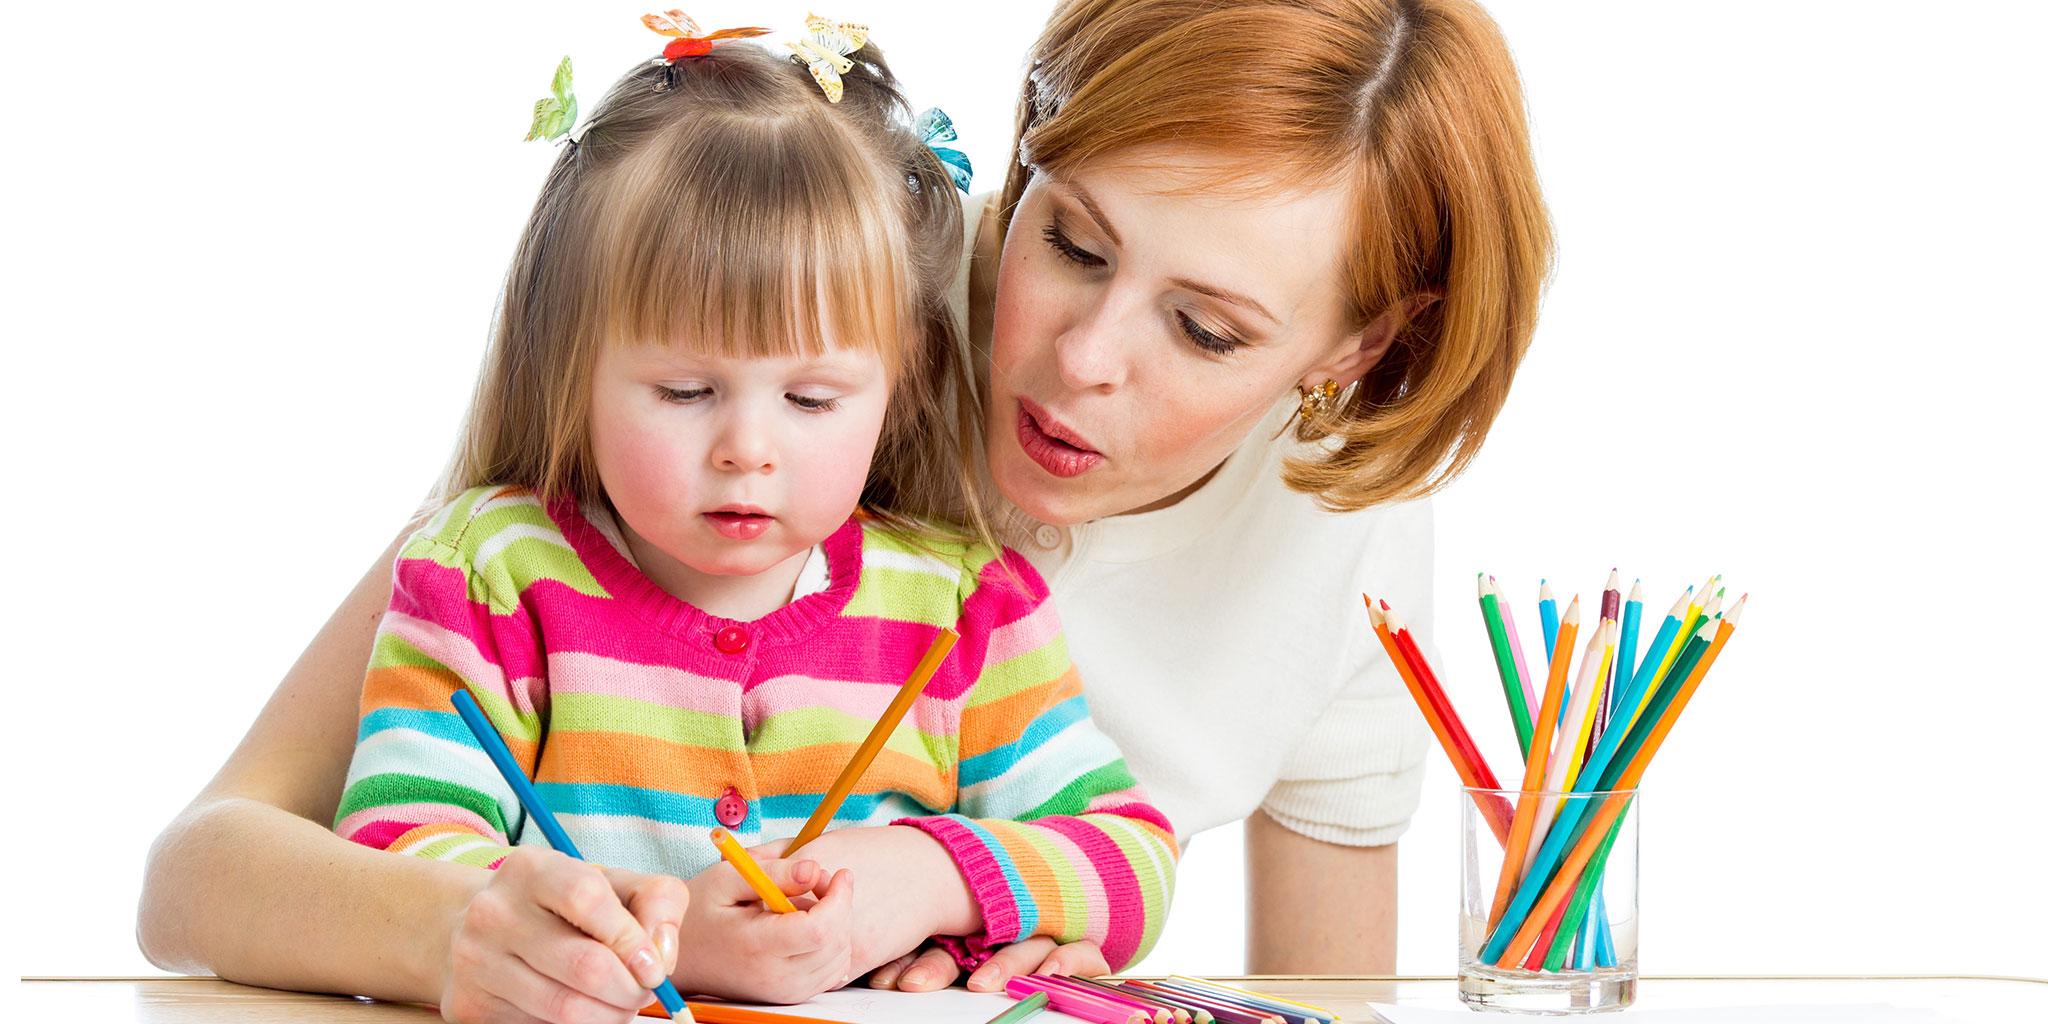 Babysitter, tata o educatore?